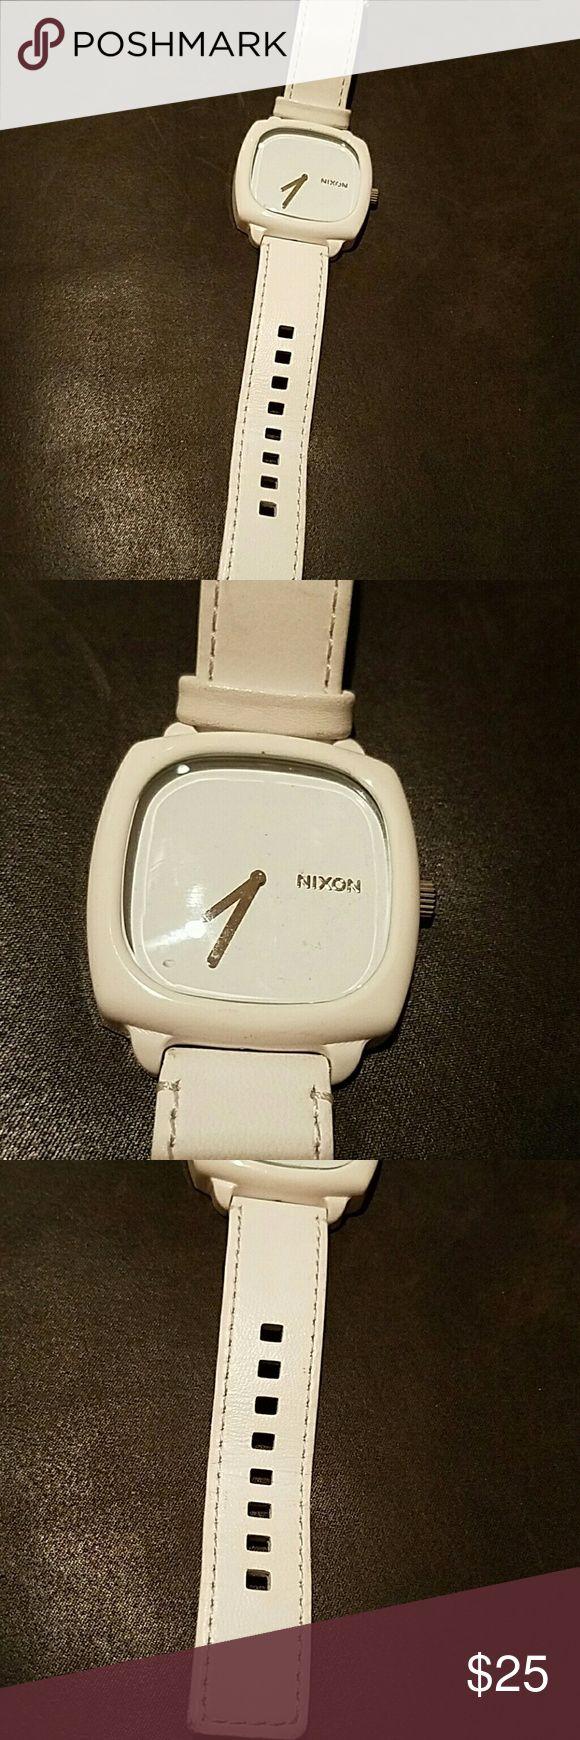 Nixon shutter watch Excellent condition white Nixon women's watch no box  needs new battery Nixon Accessories Watches